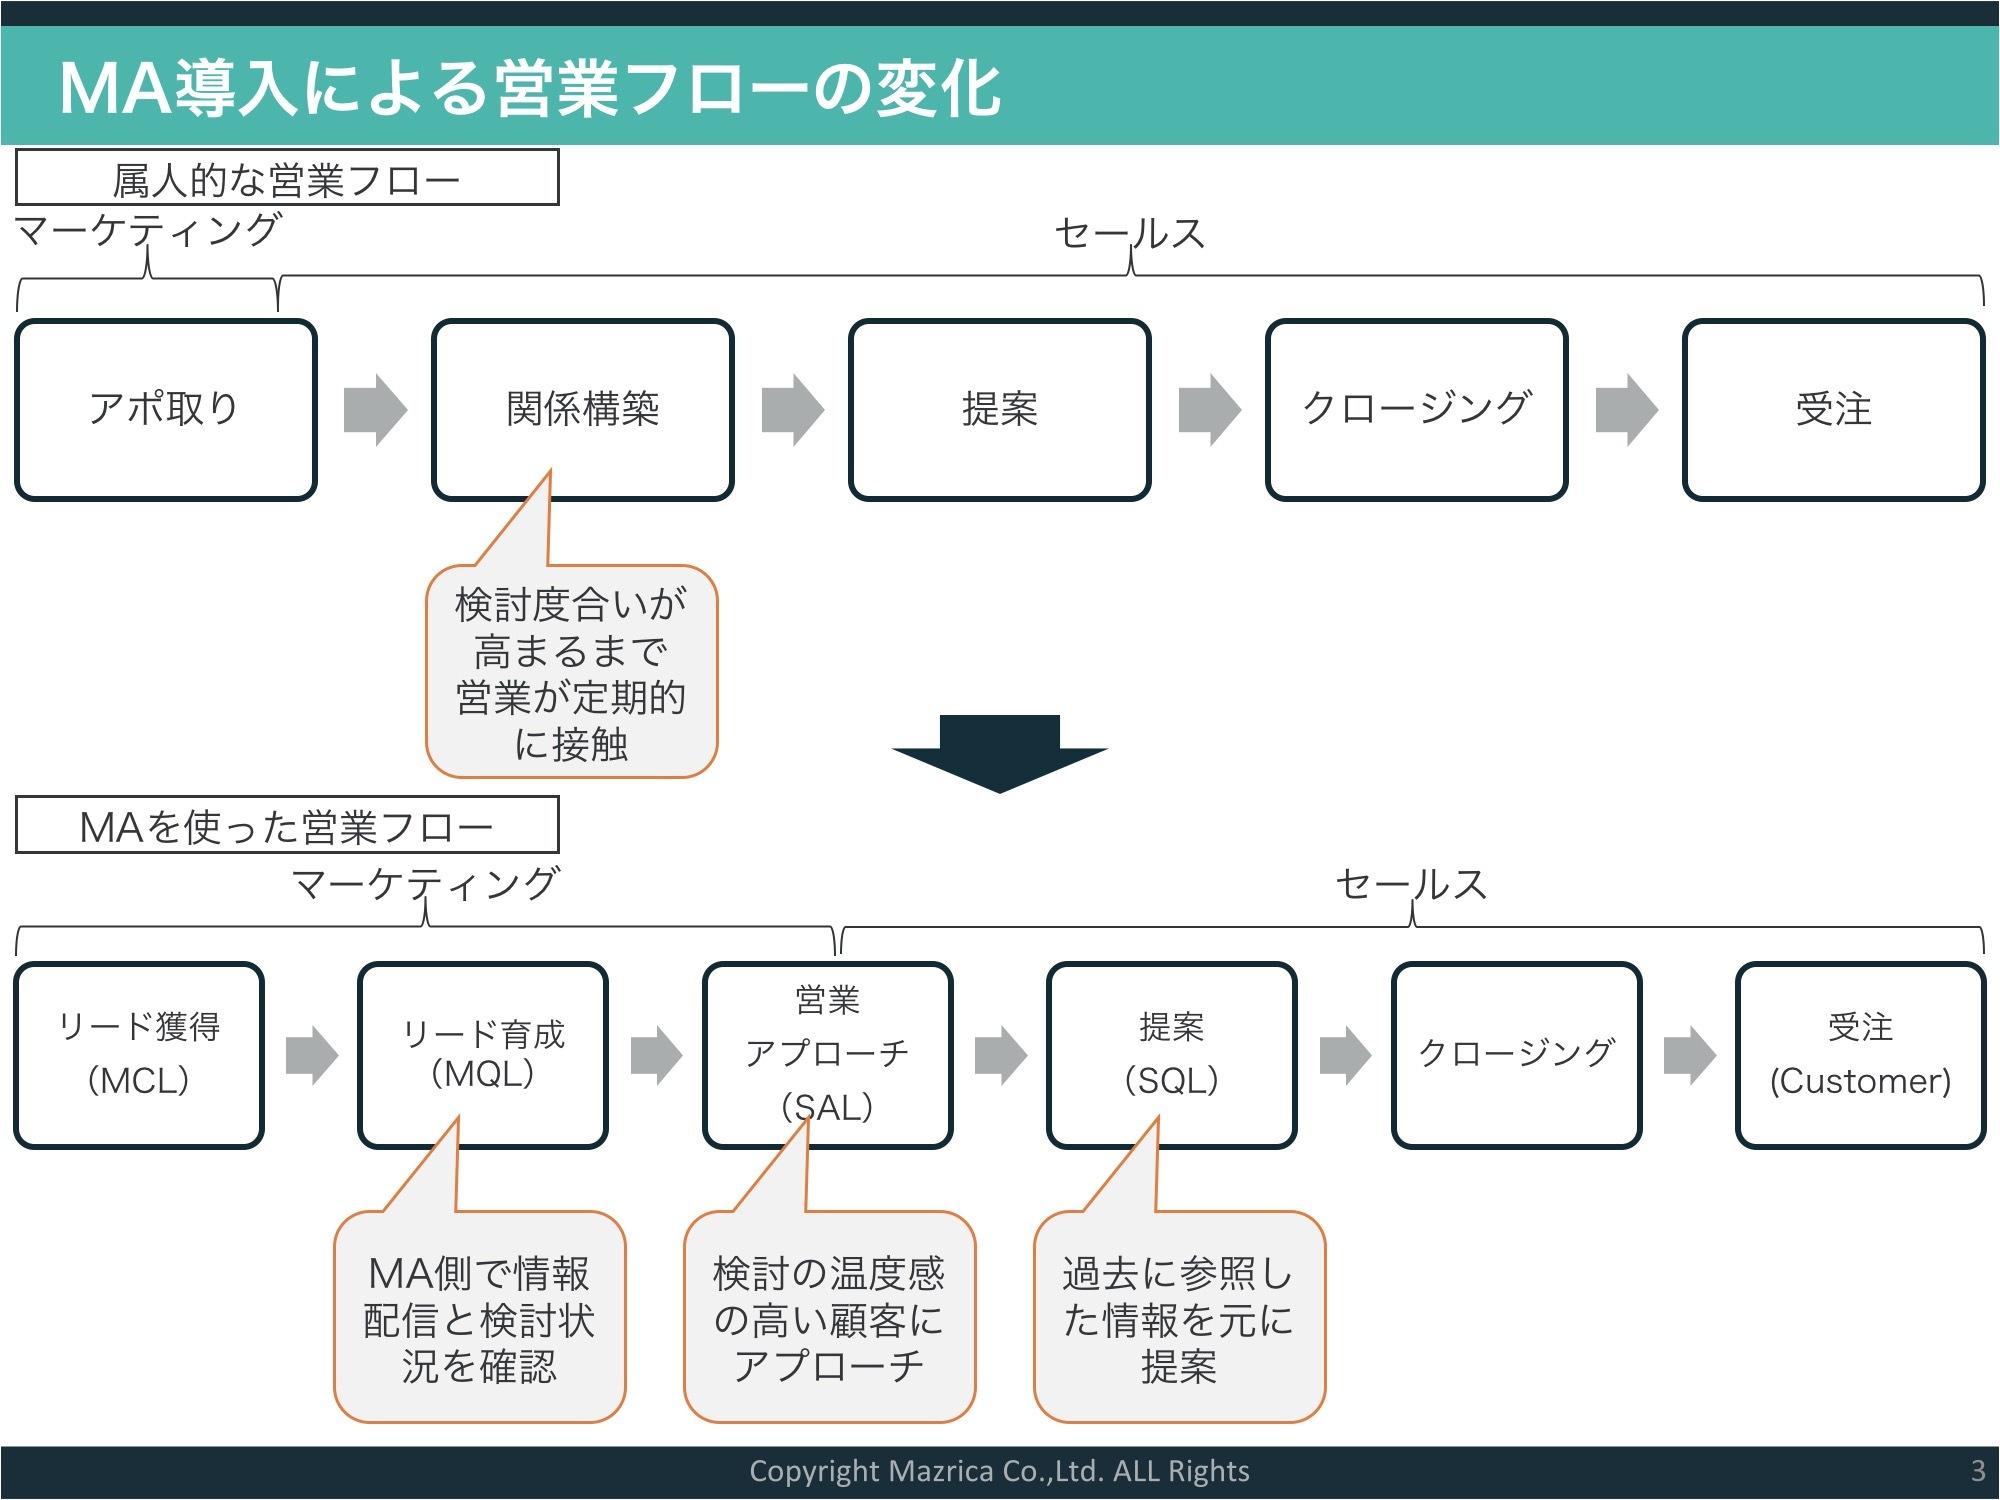 MA導入による営業フローの変化